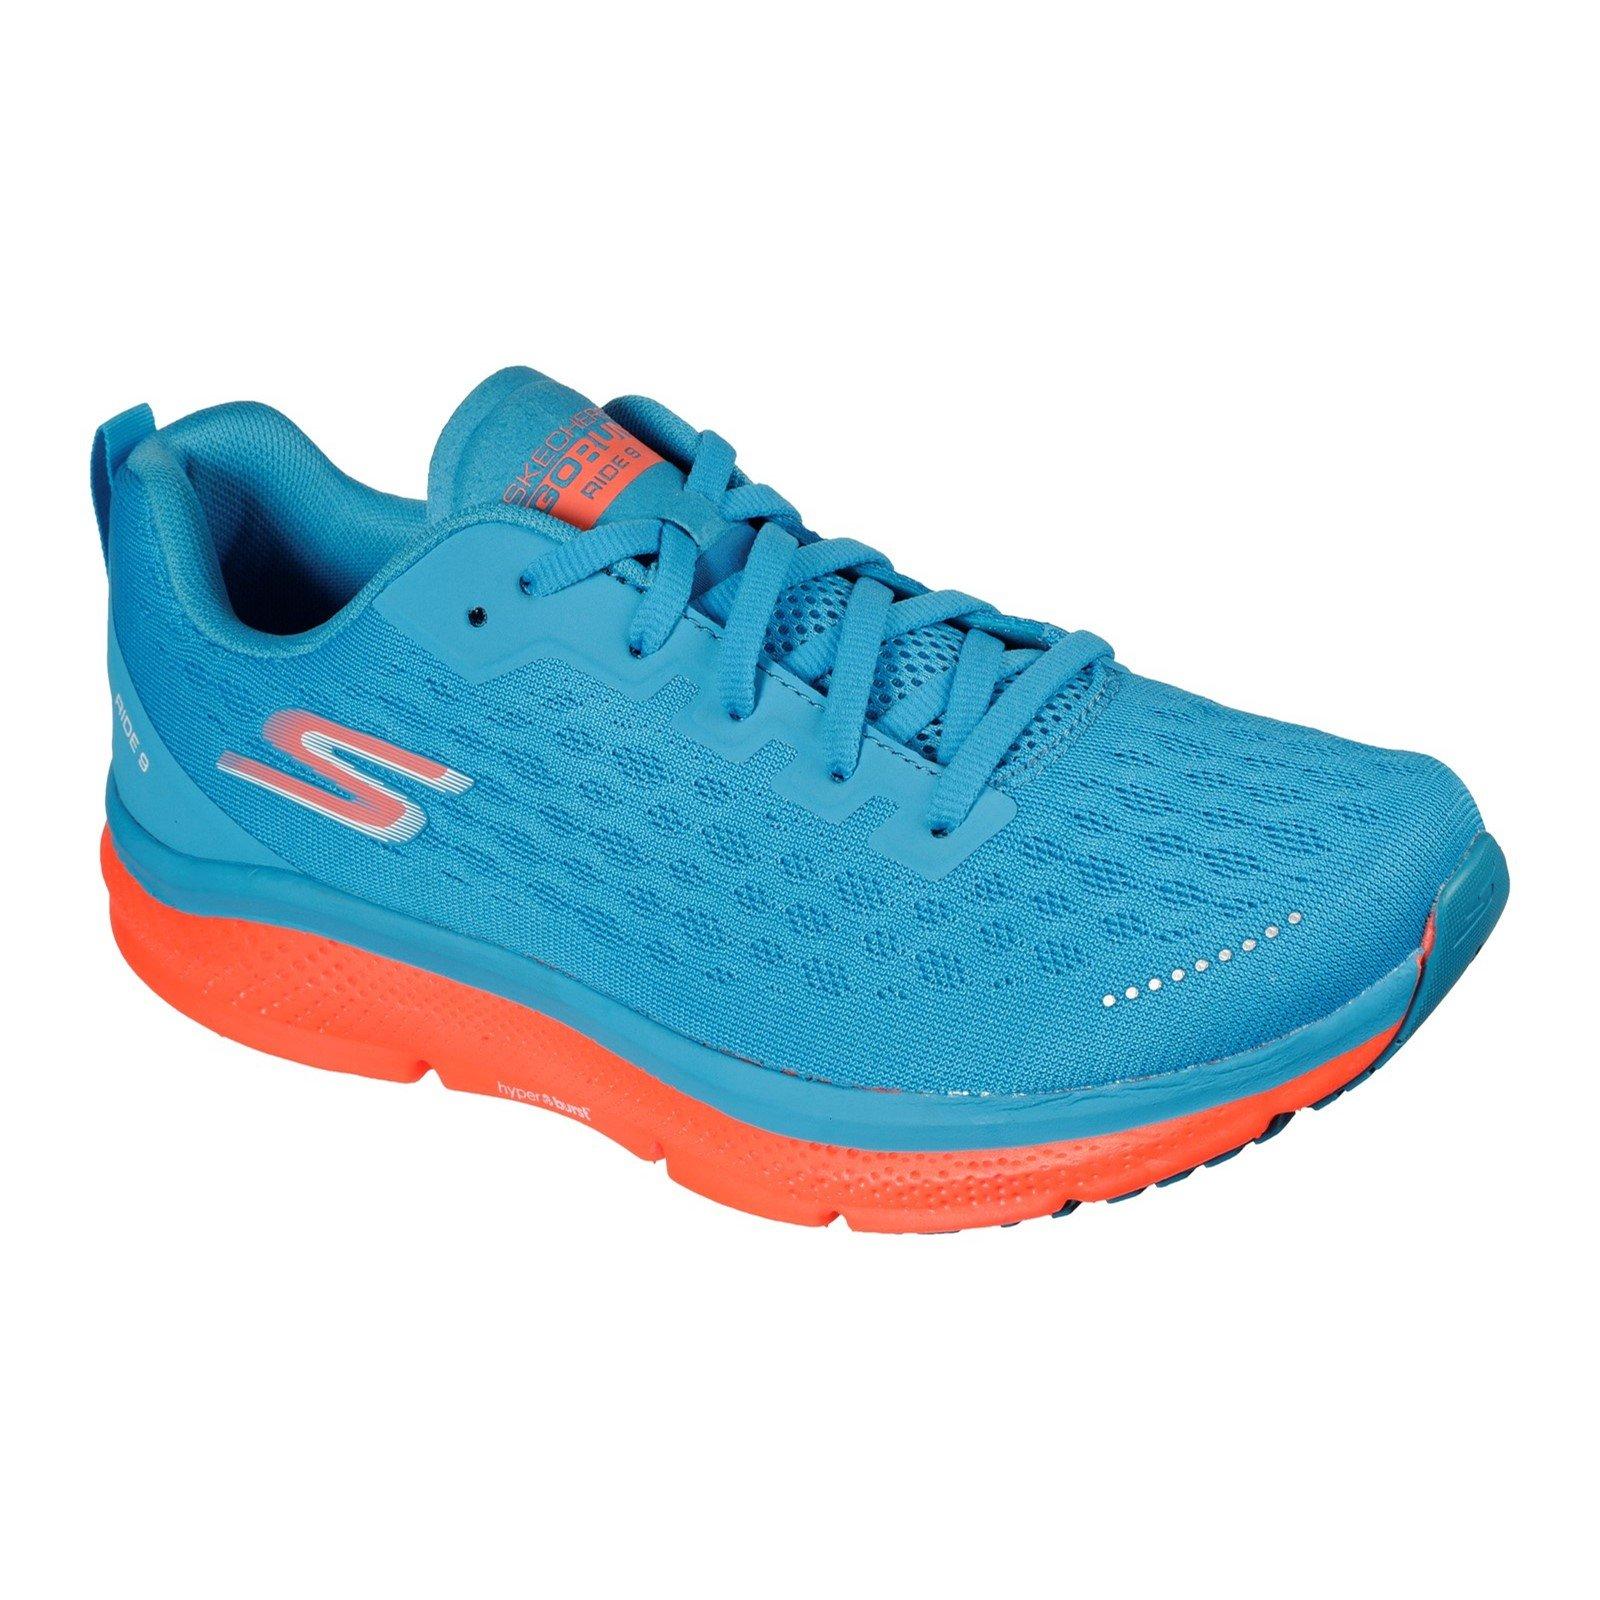 Skechers Men's Go Run Ride 9 Trainer Various Colours 32701 - Blue/Coral 9